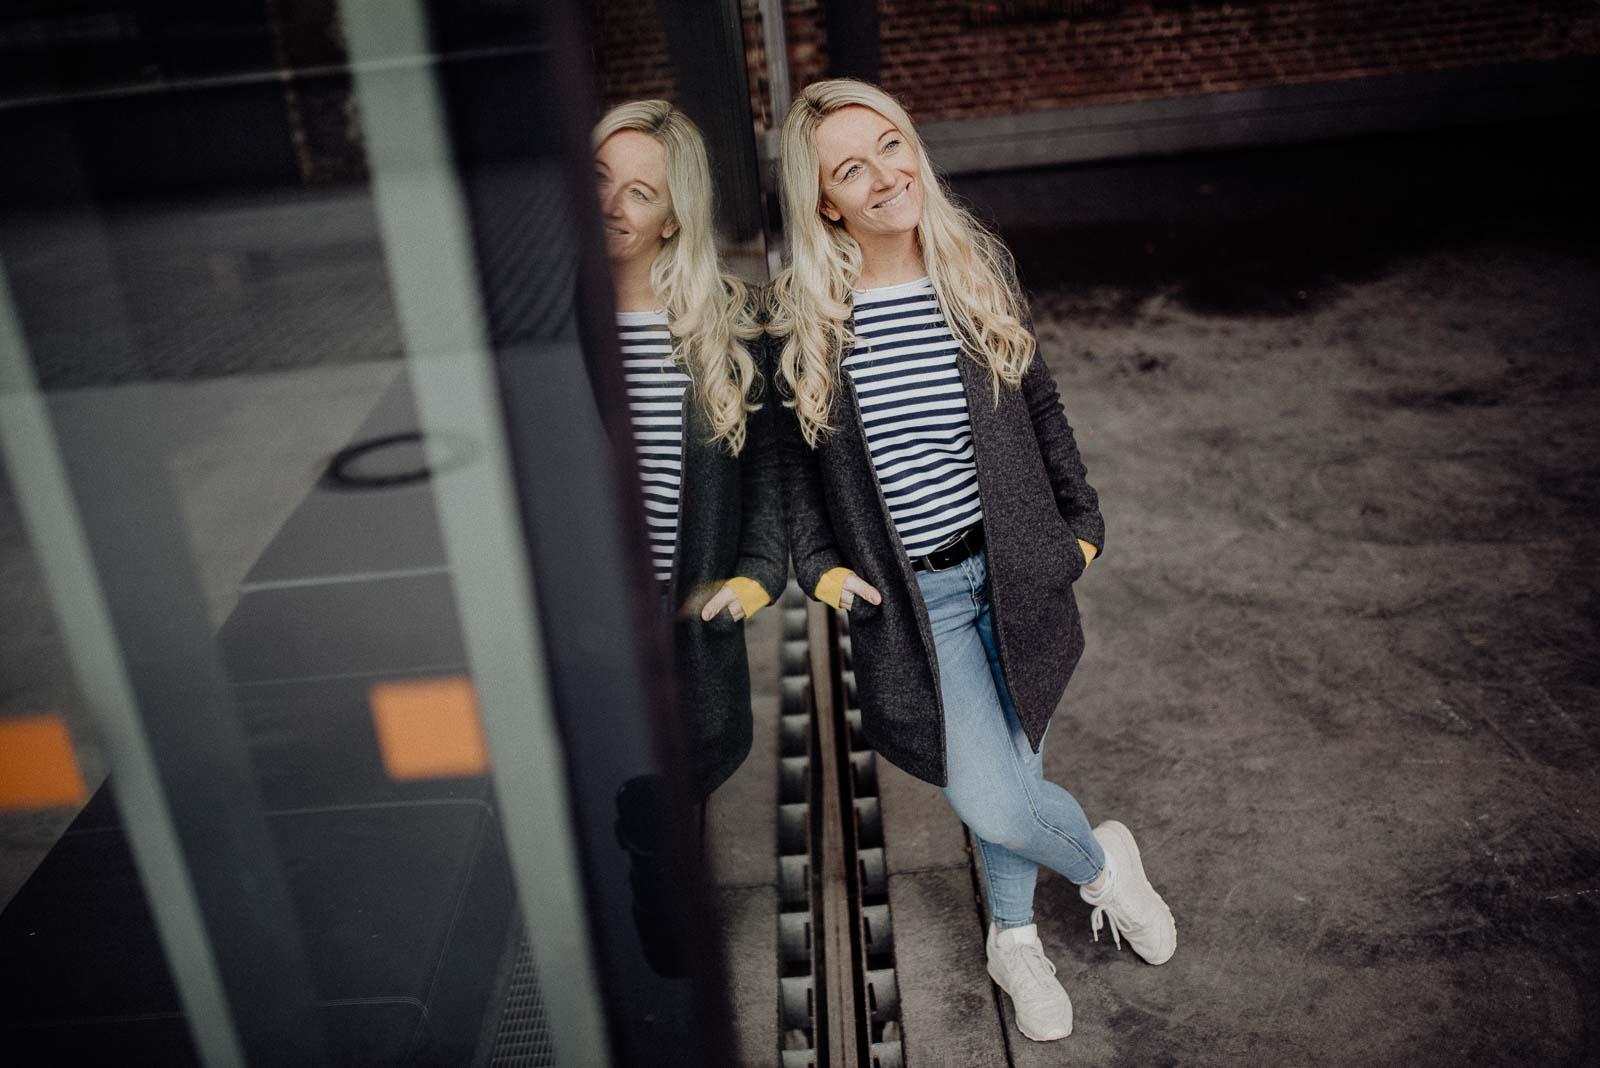 004-fotograf-witten-bochum-businessshooting-urban